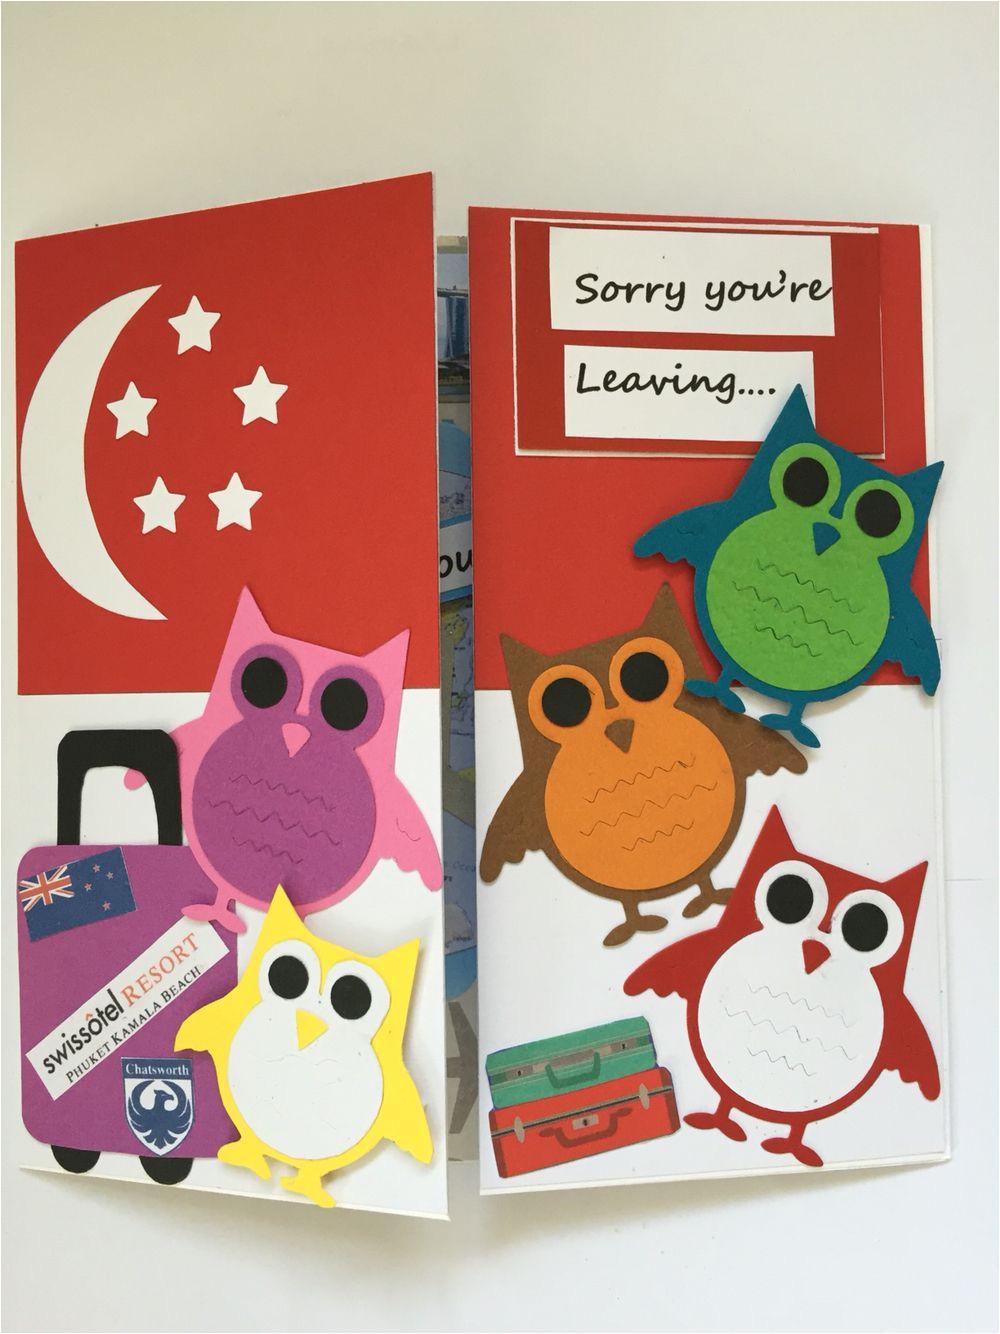 Diy Farewell Card for Colleague Farewell Card with Images Goodbye Cards Farewell Cards